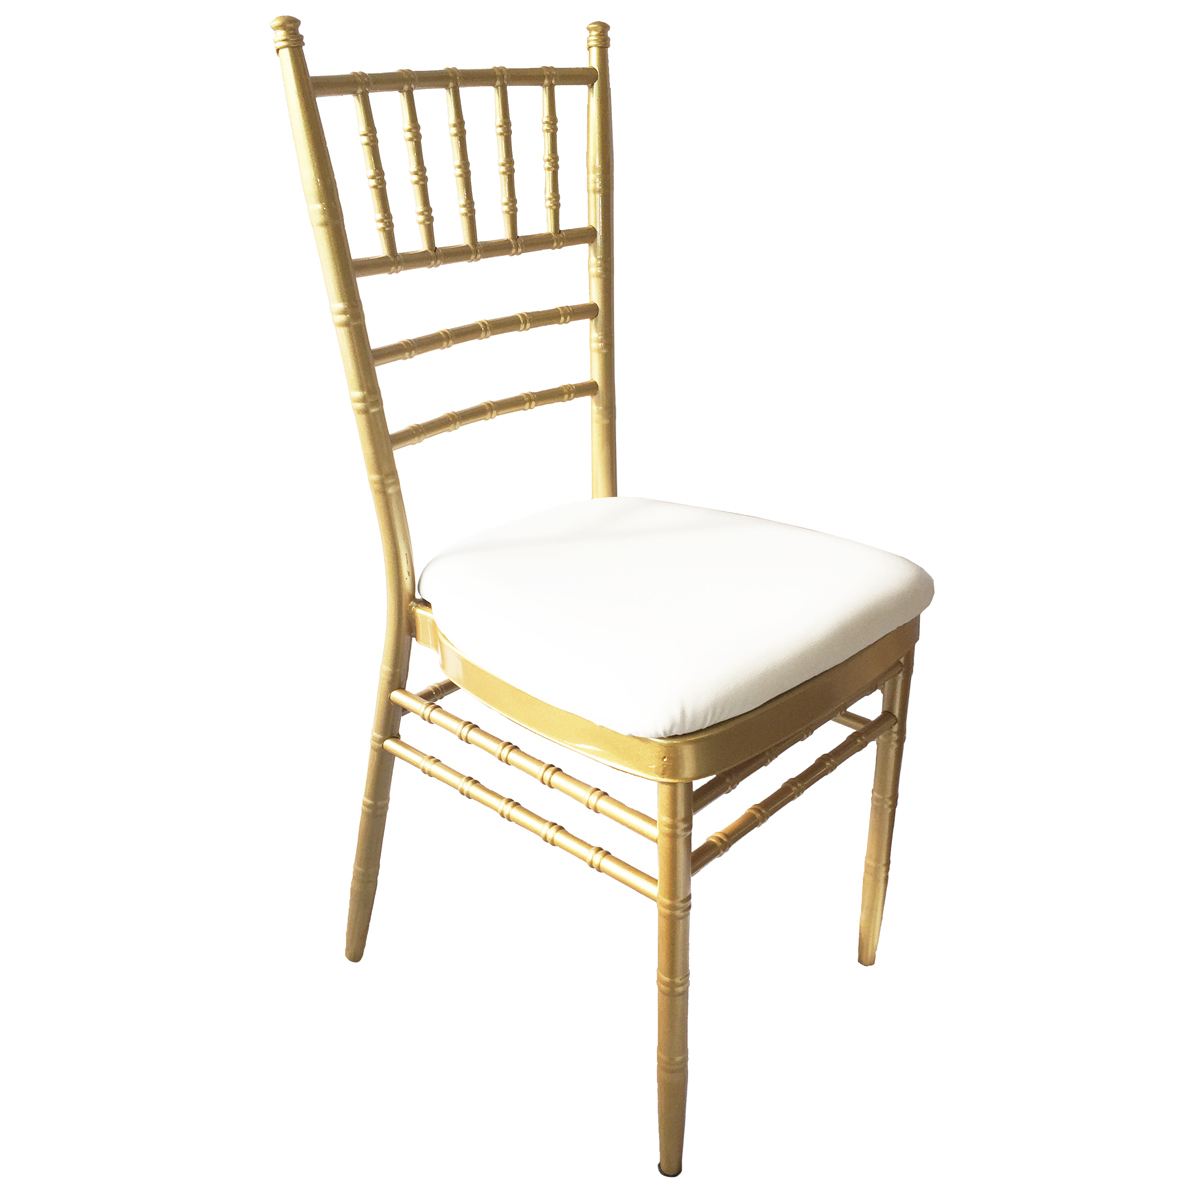 Light Gold Chiavari Chair Rental Light Gold Chiavari Chair Rentals